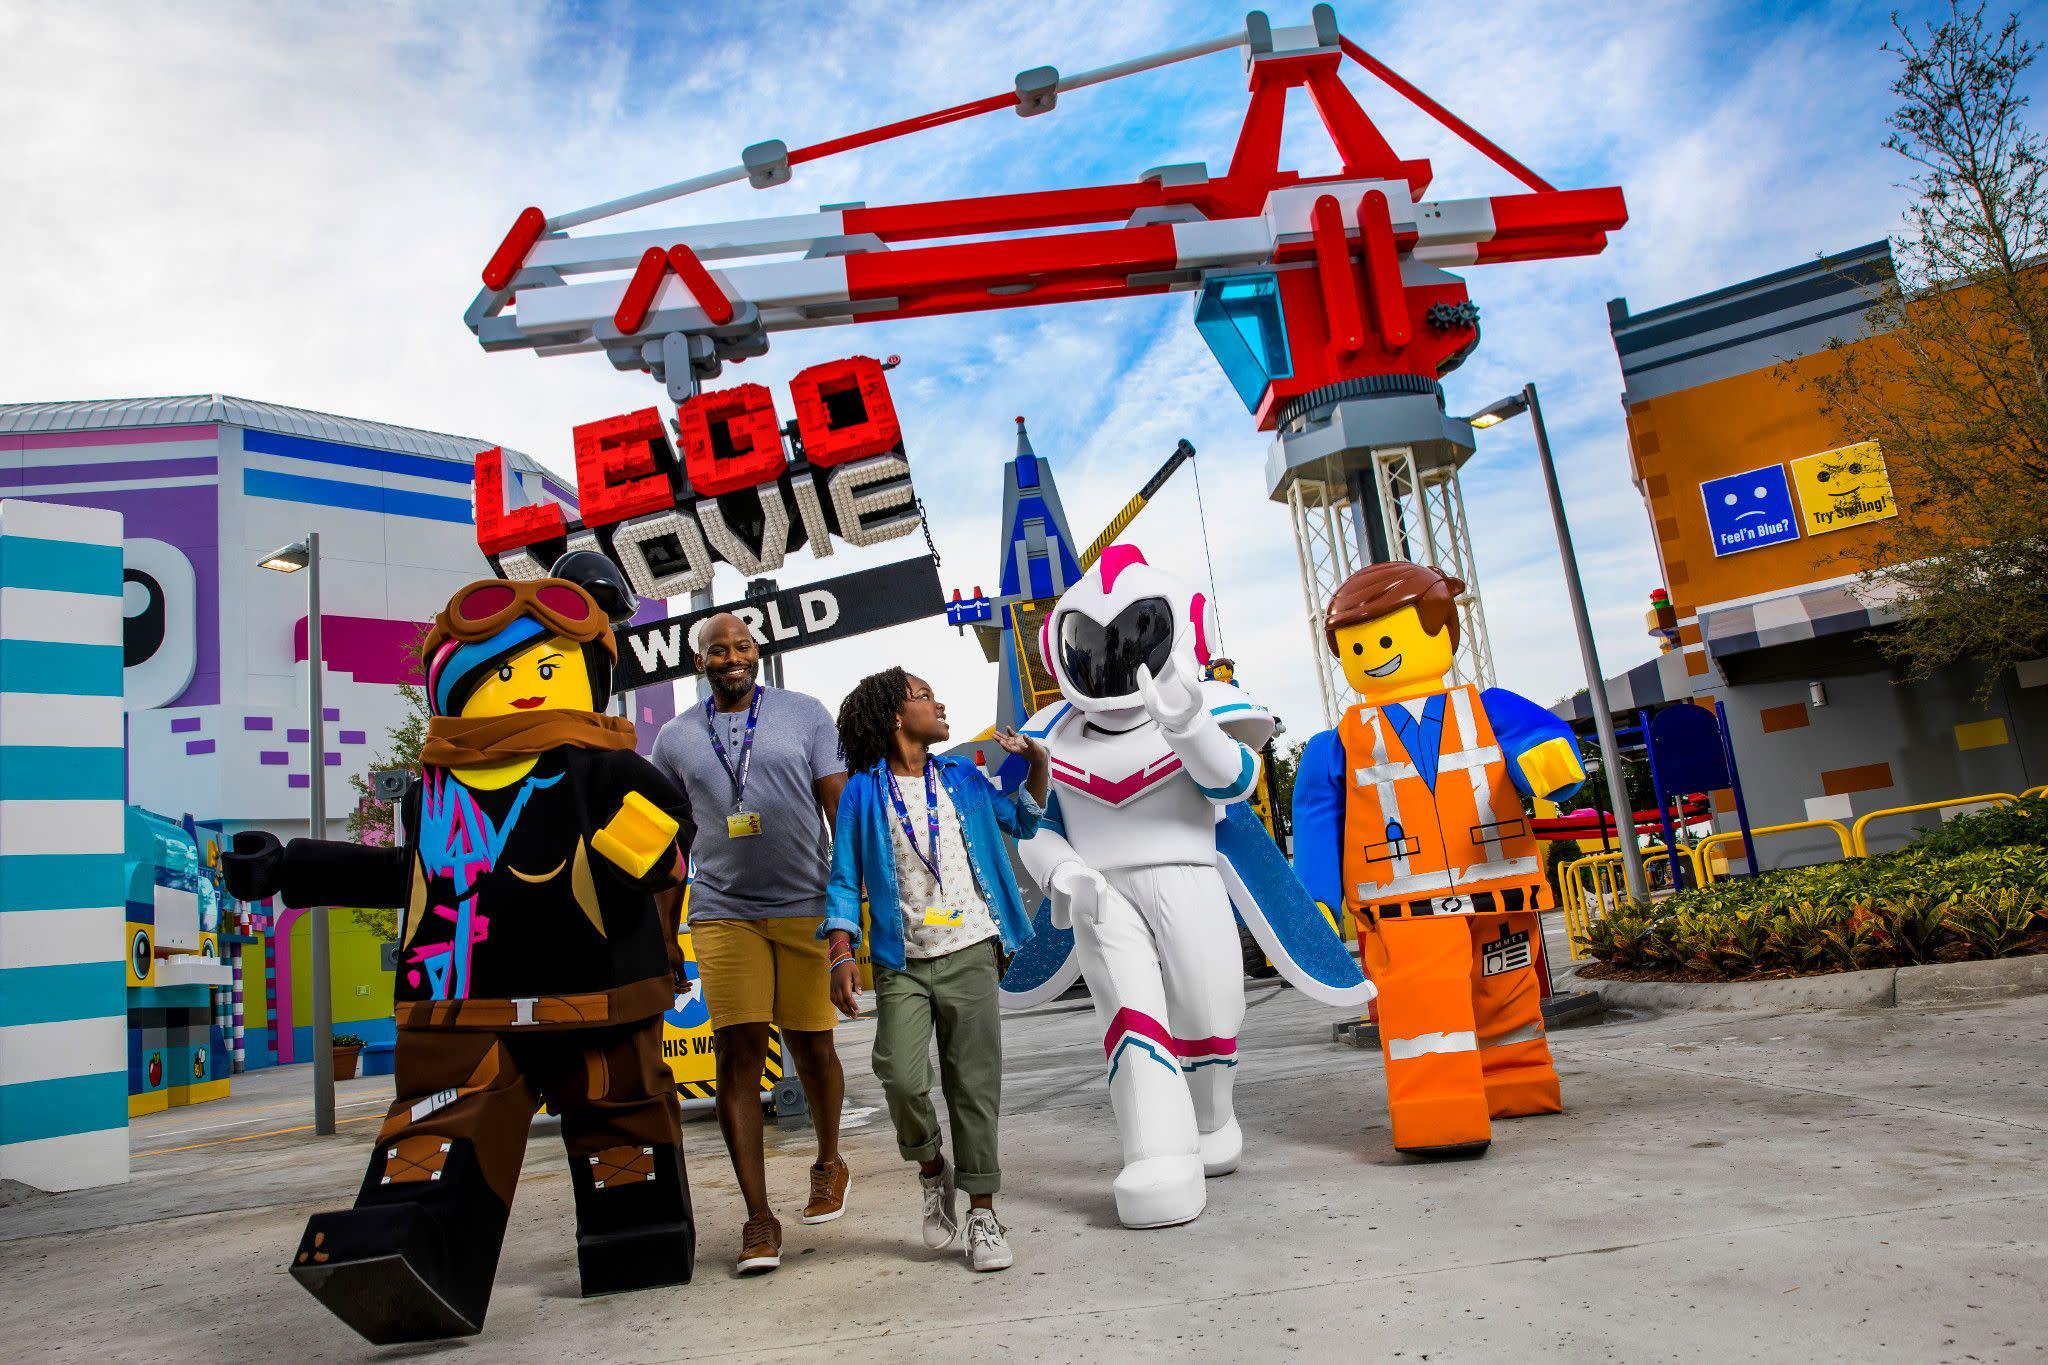 THE LEGO MOVIE WORLD at LEGOLAND Florida Resort Near Orlando